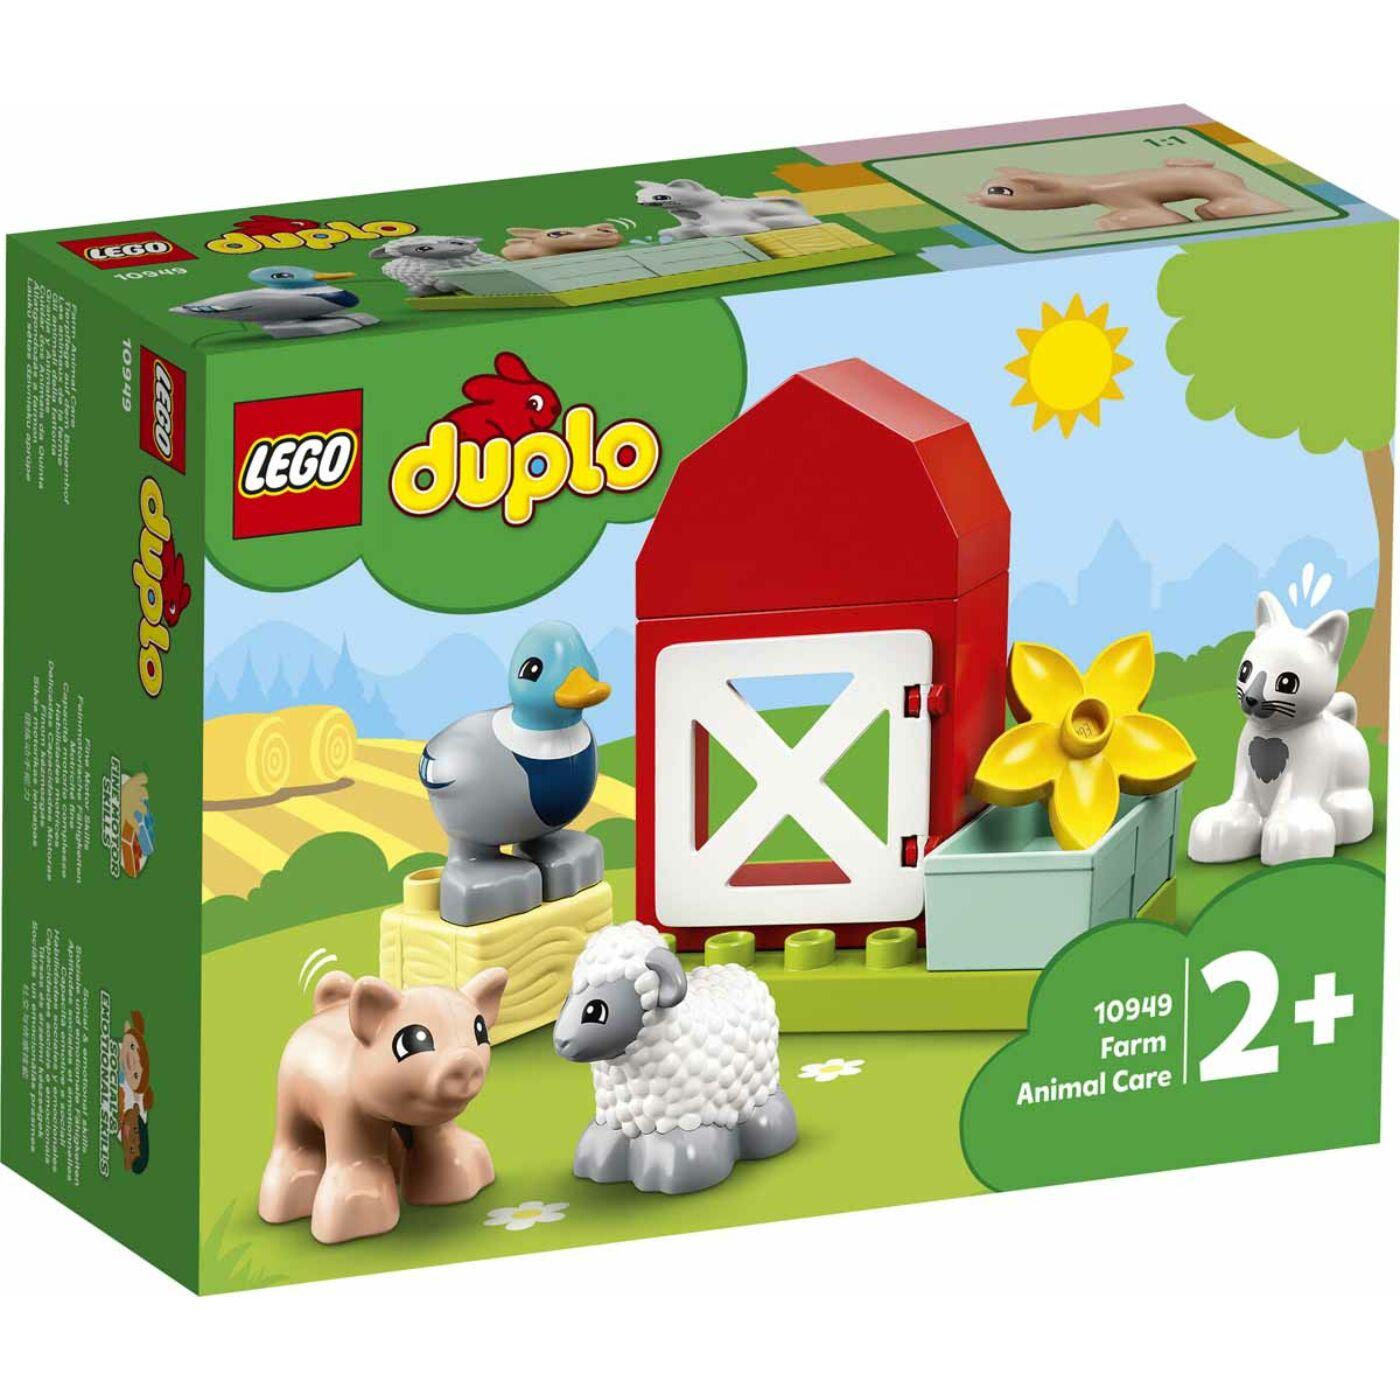 Lego Duplo Állatgondozás a farmon